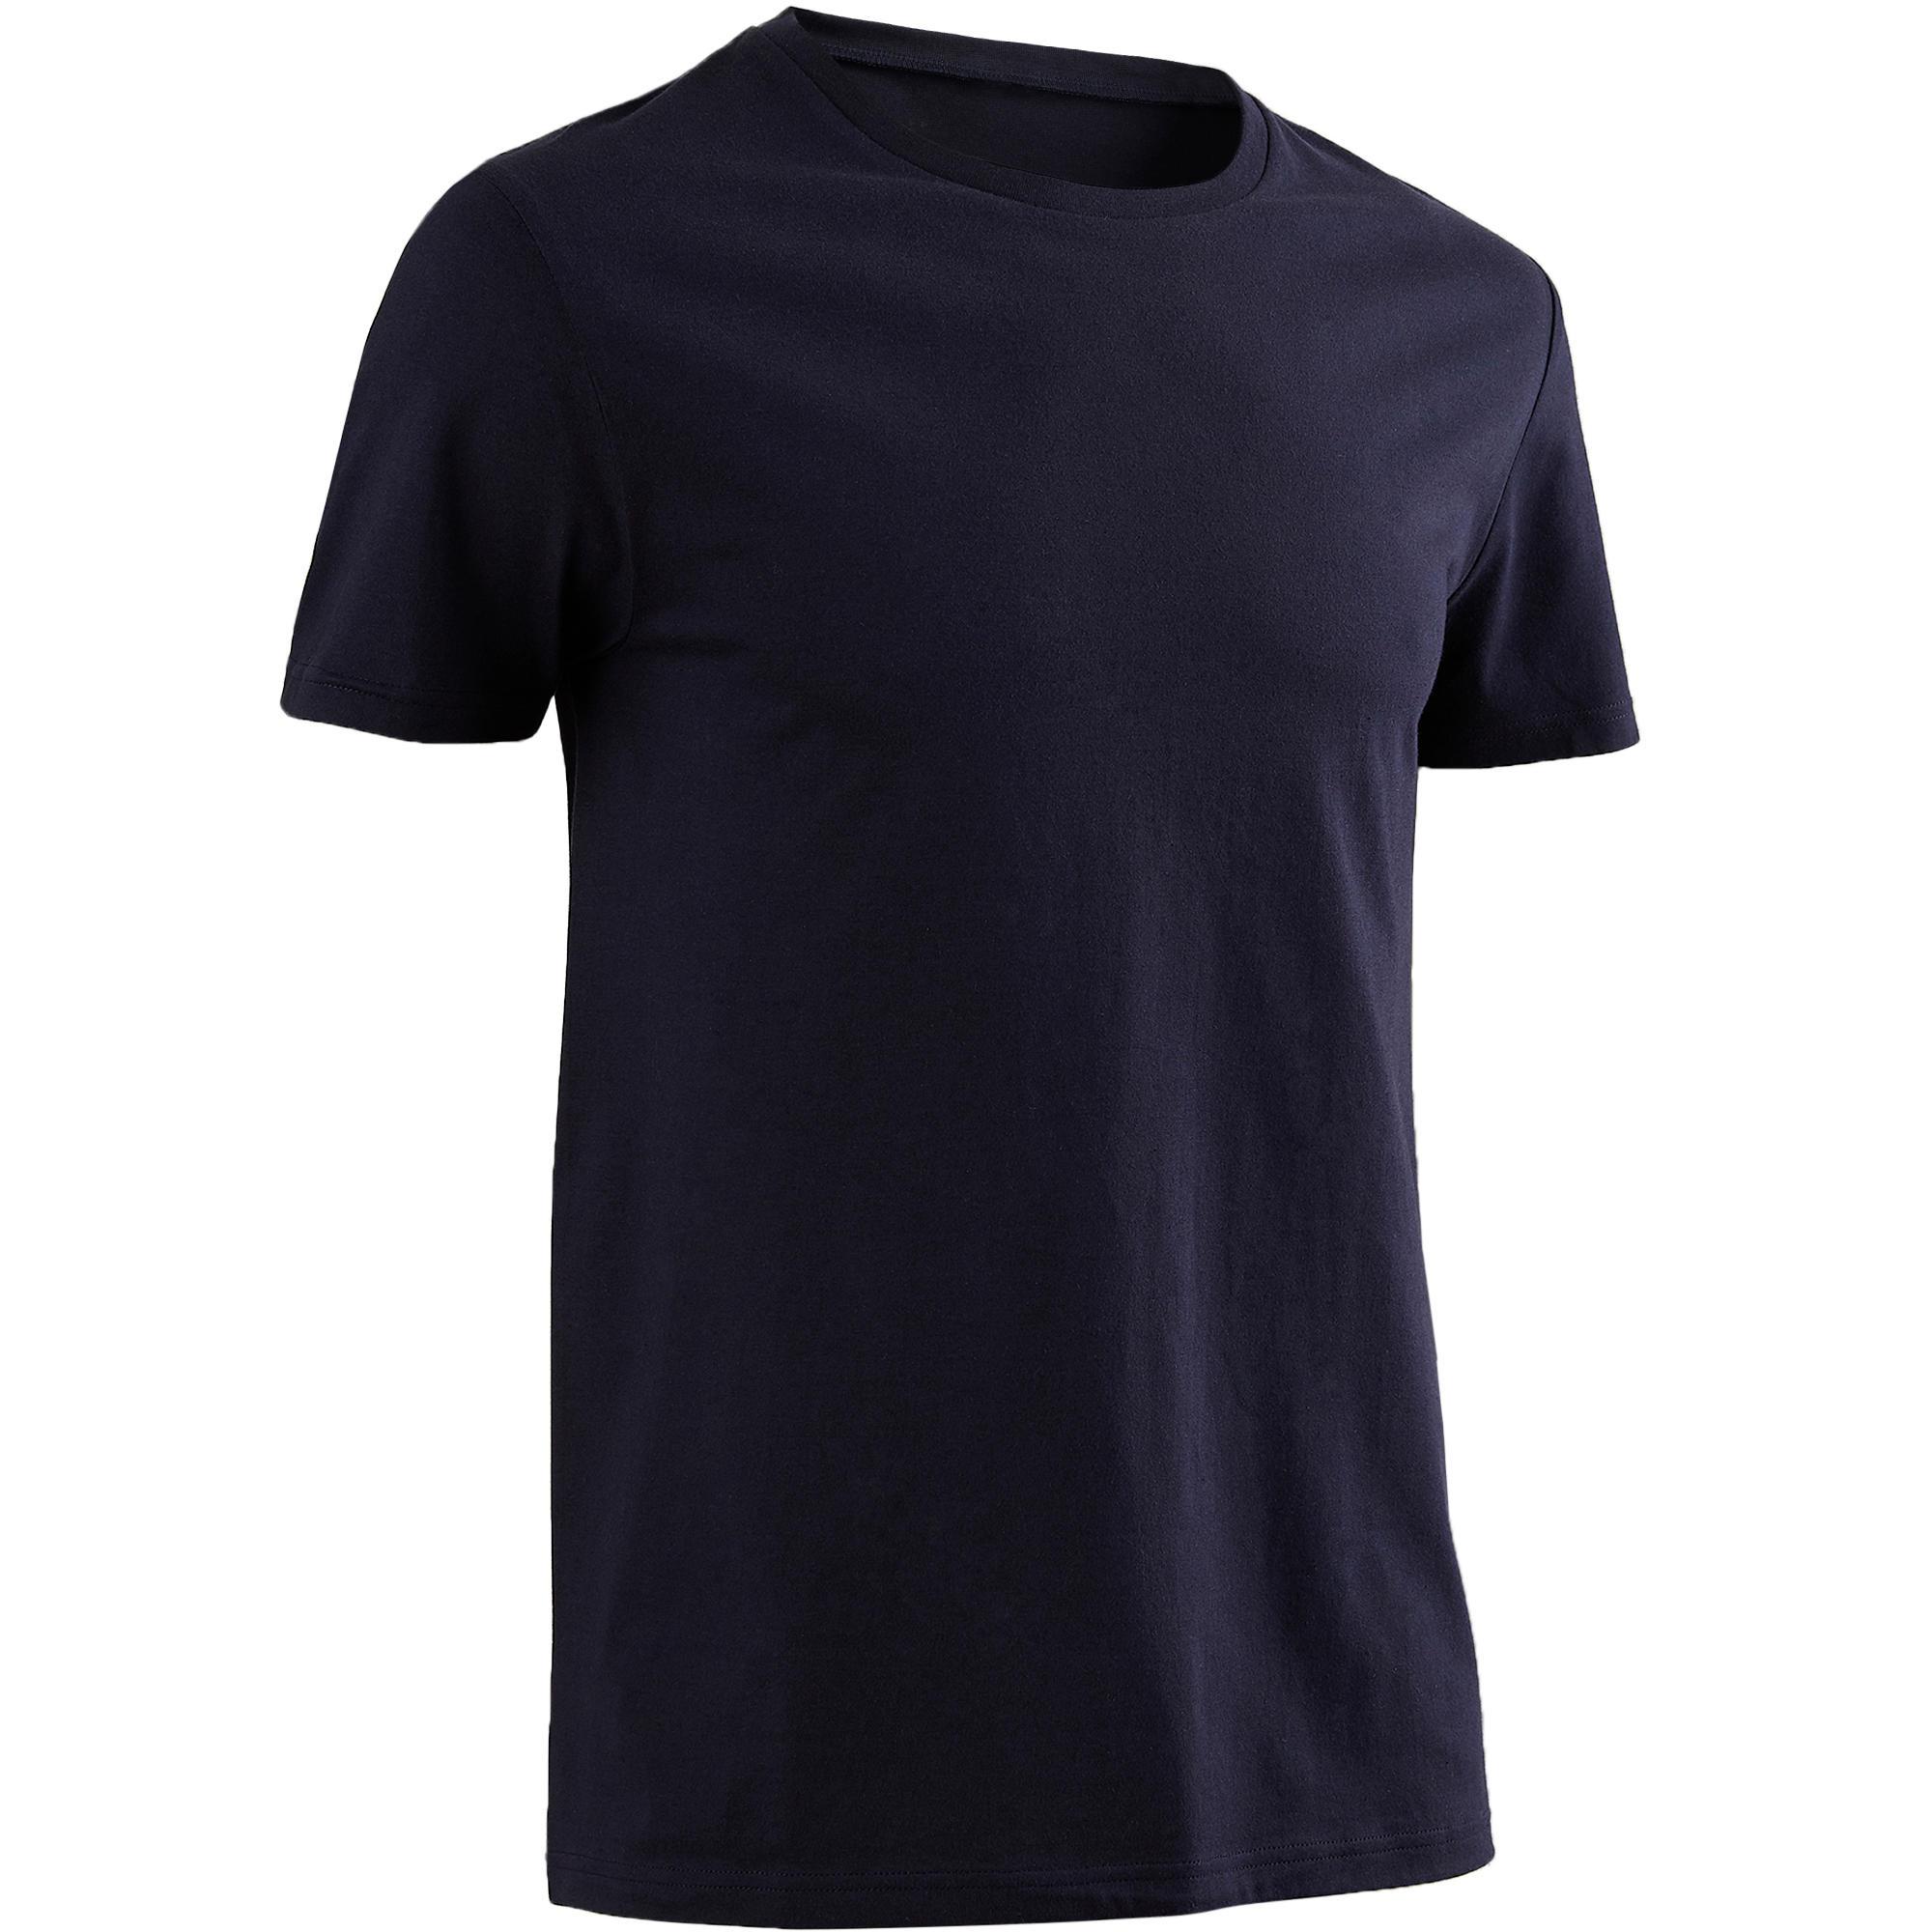 tee shirt homme pas cher decathlon